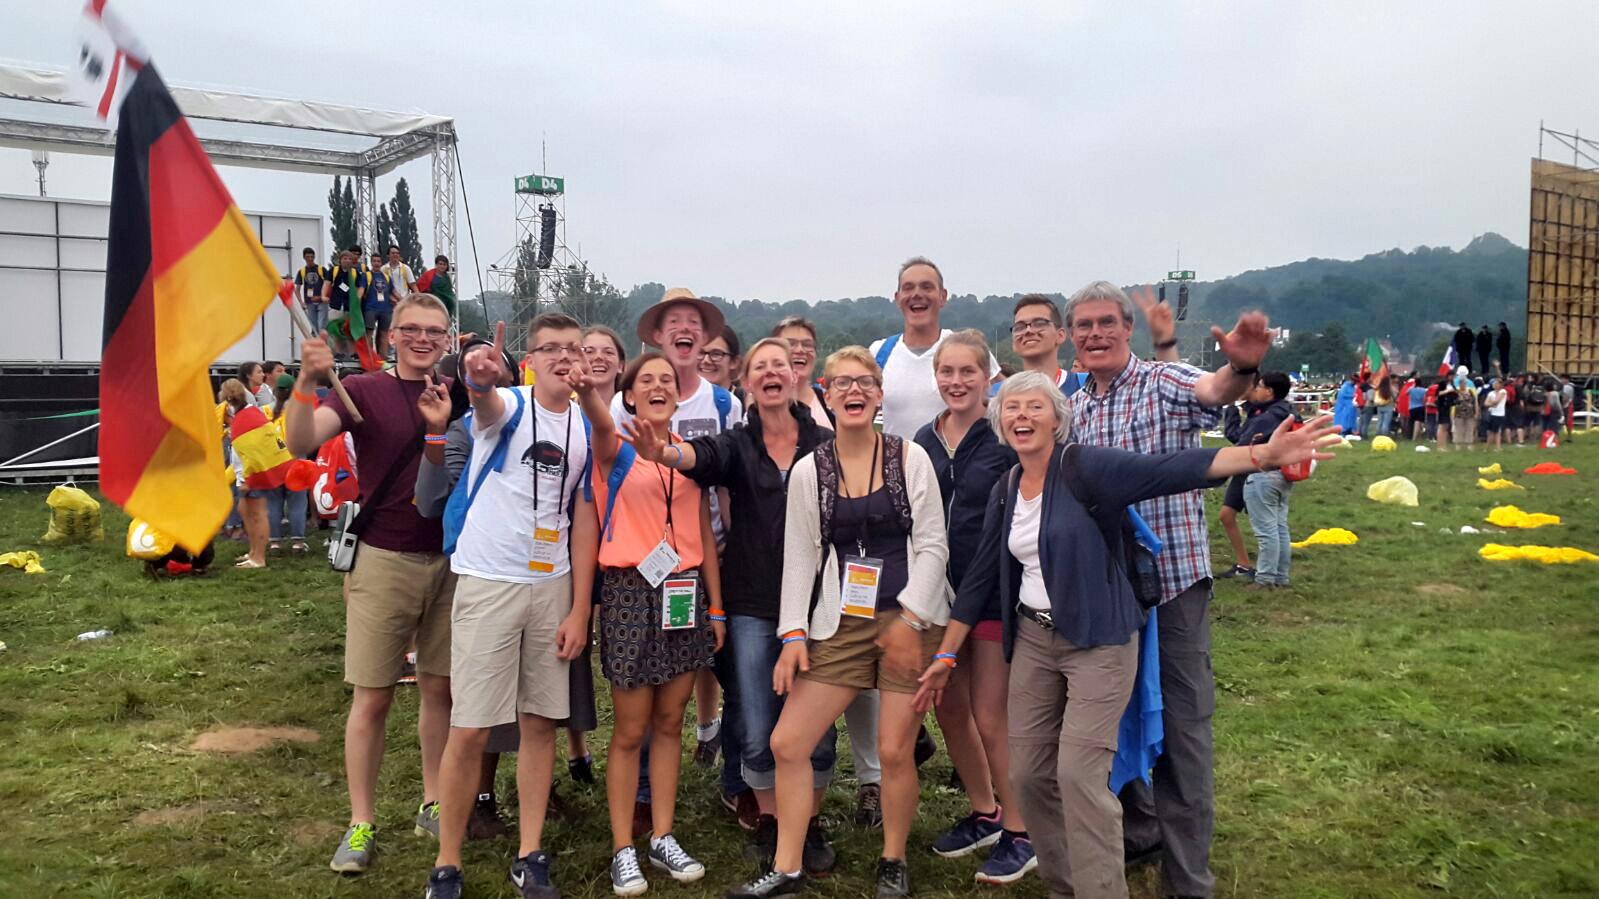 Weltjugendtag in Krakau | Messdienerleiter von Hiddingsel